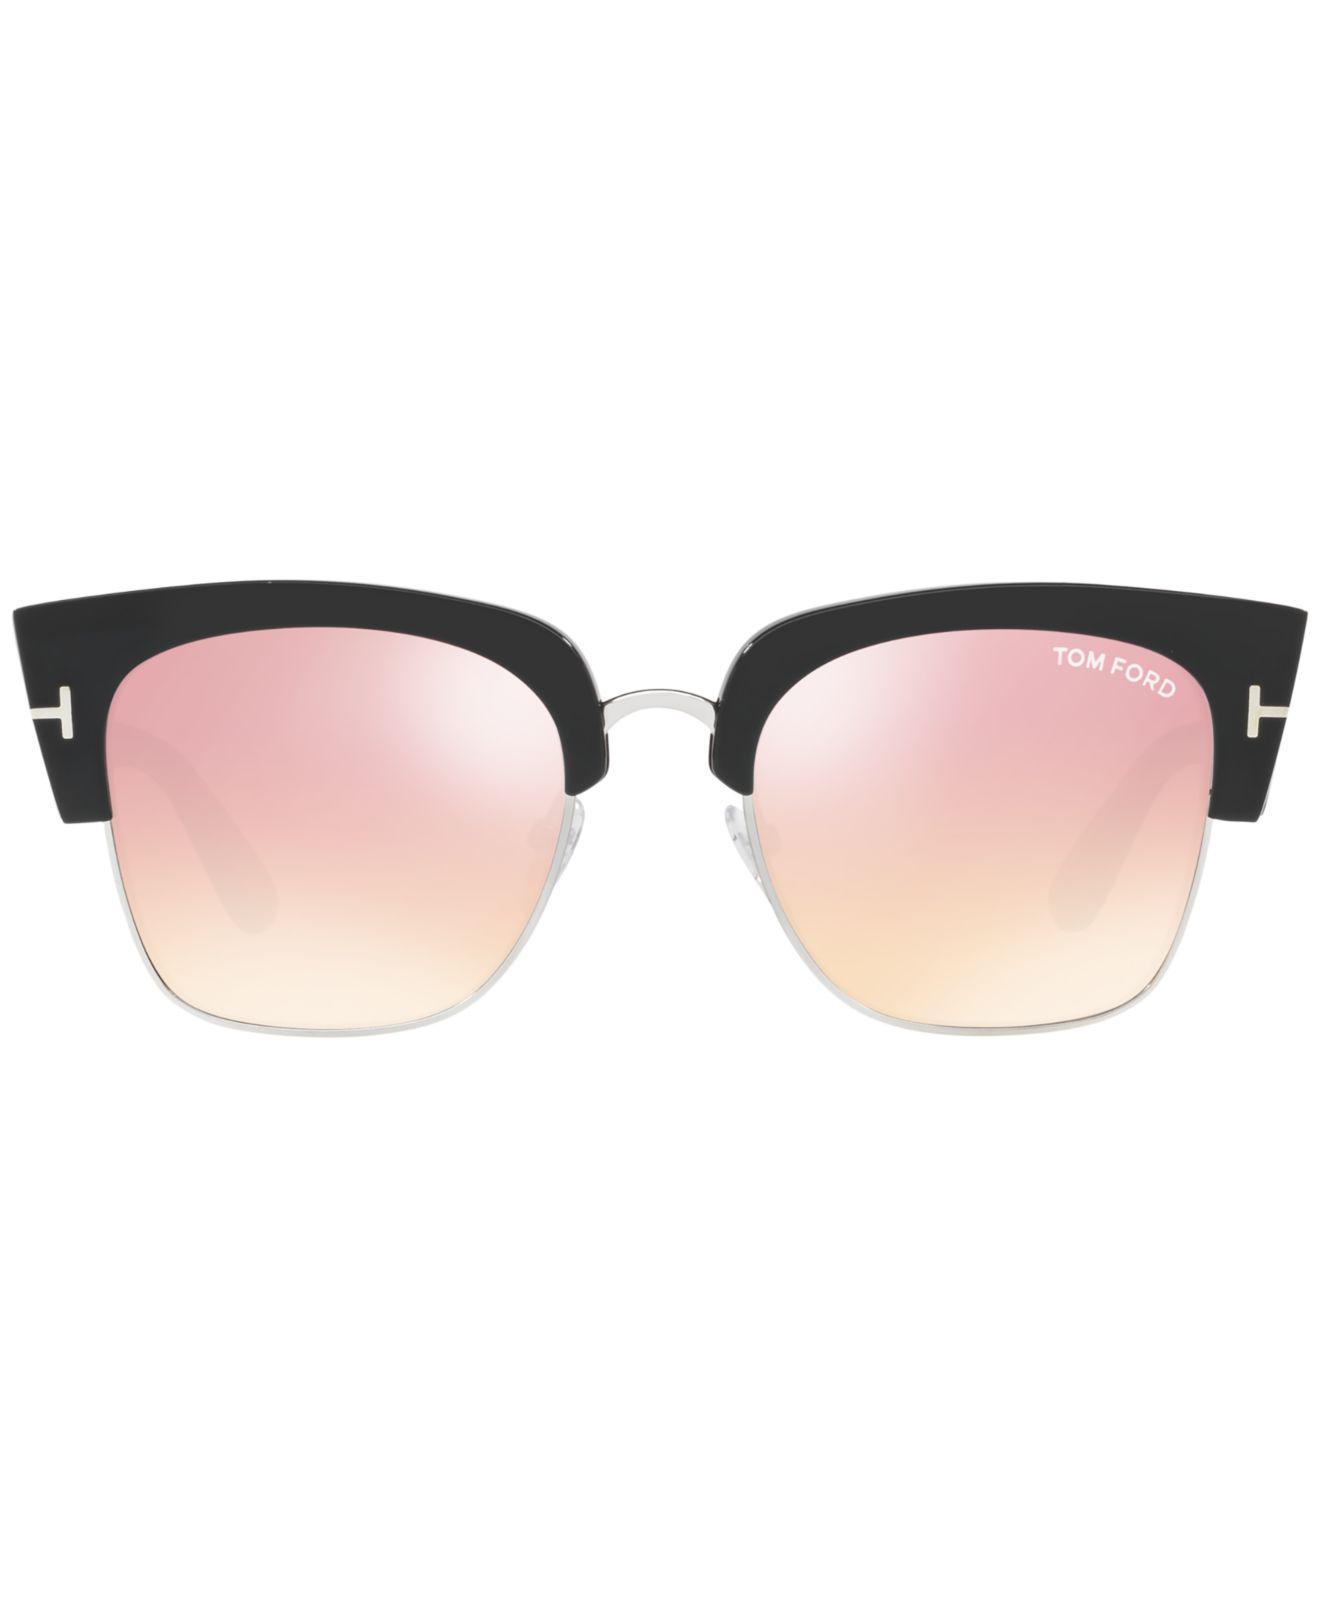 af5b796f4f Lyst - Tom Ford Dakota Sunglasses